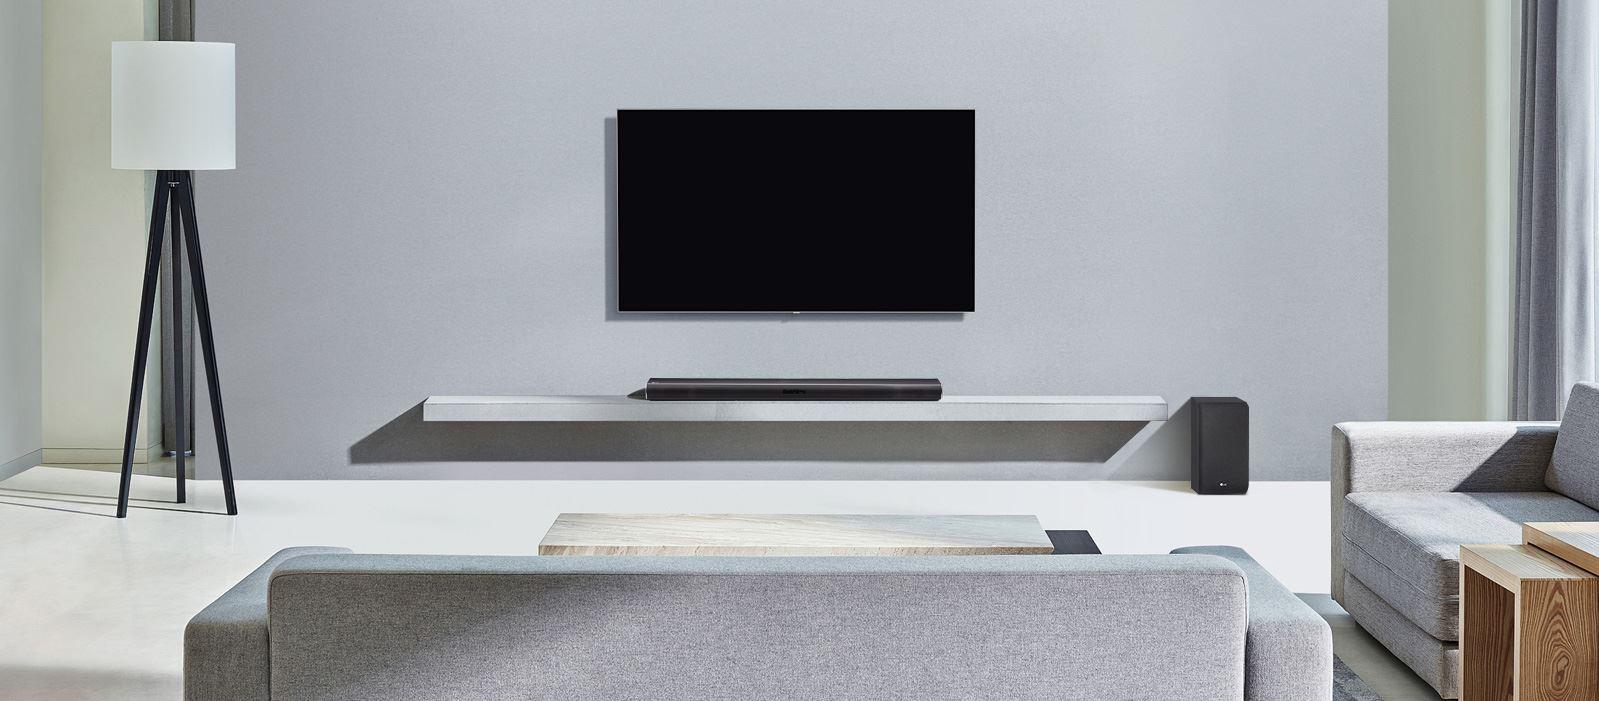 LG SJ4 hangprojektor